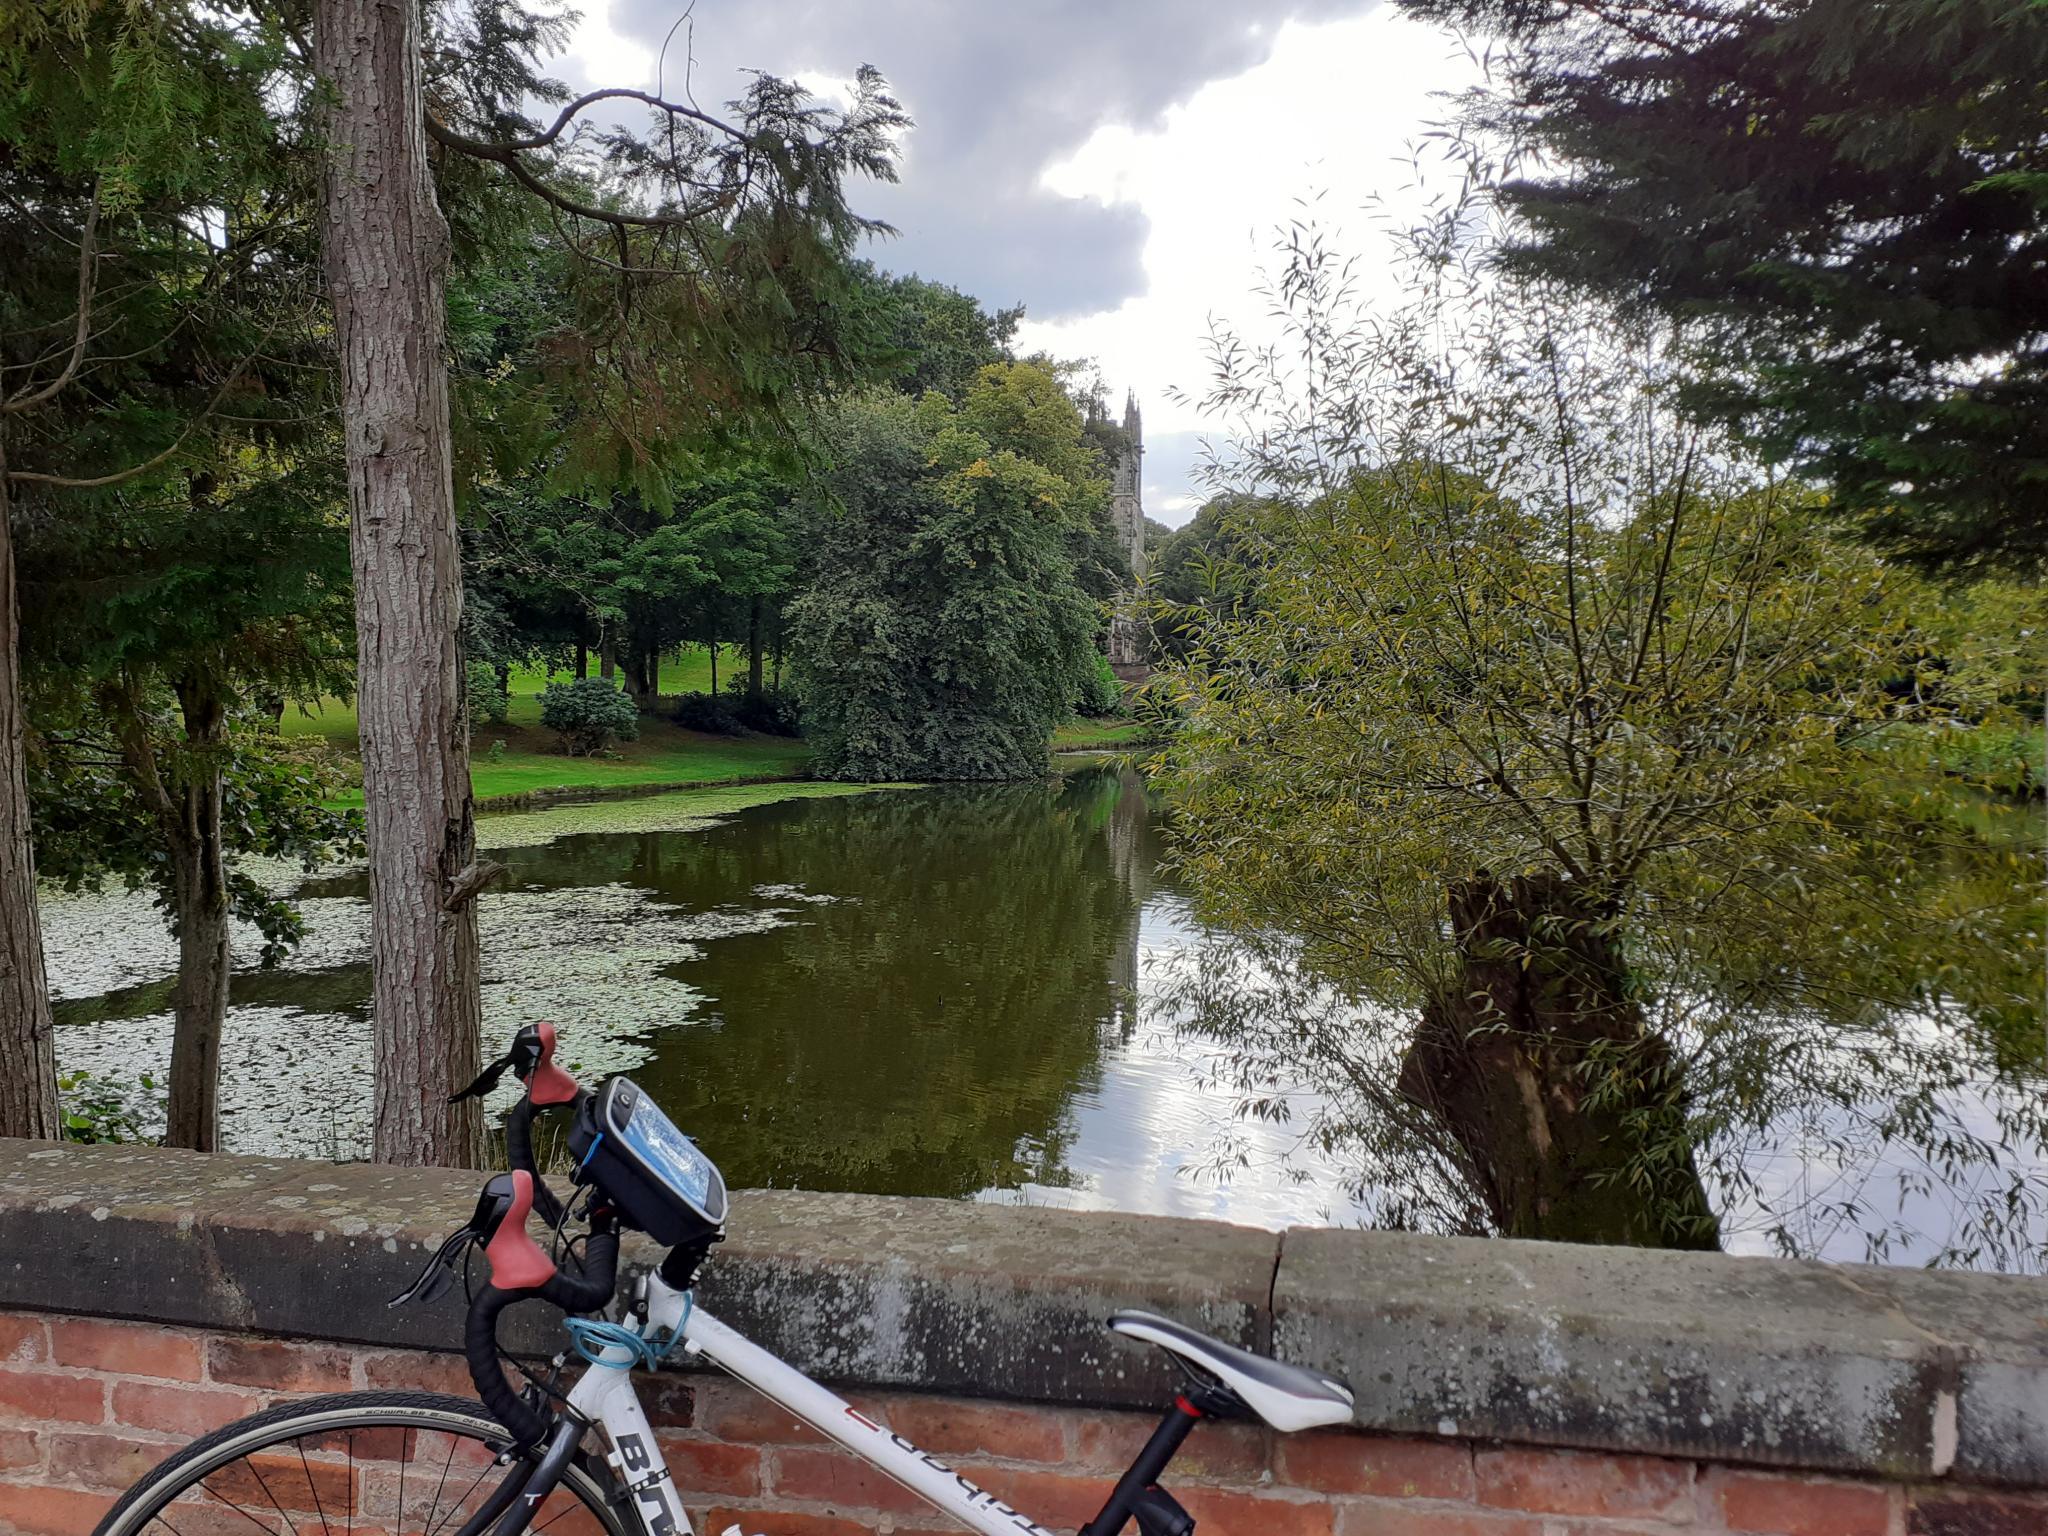 On my bike-20200831_162641-jpg